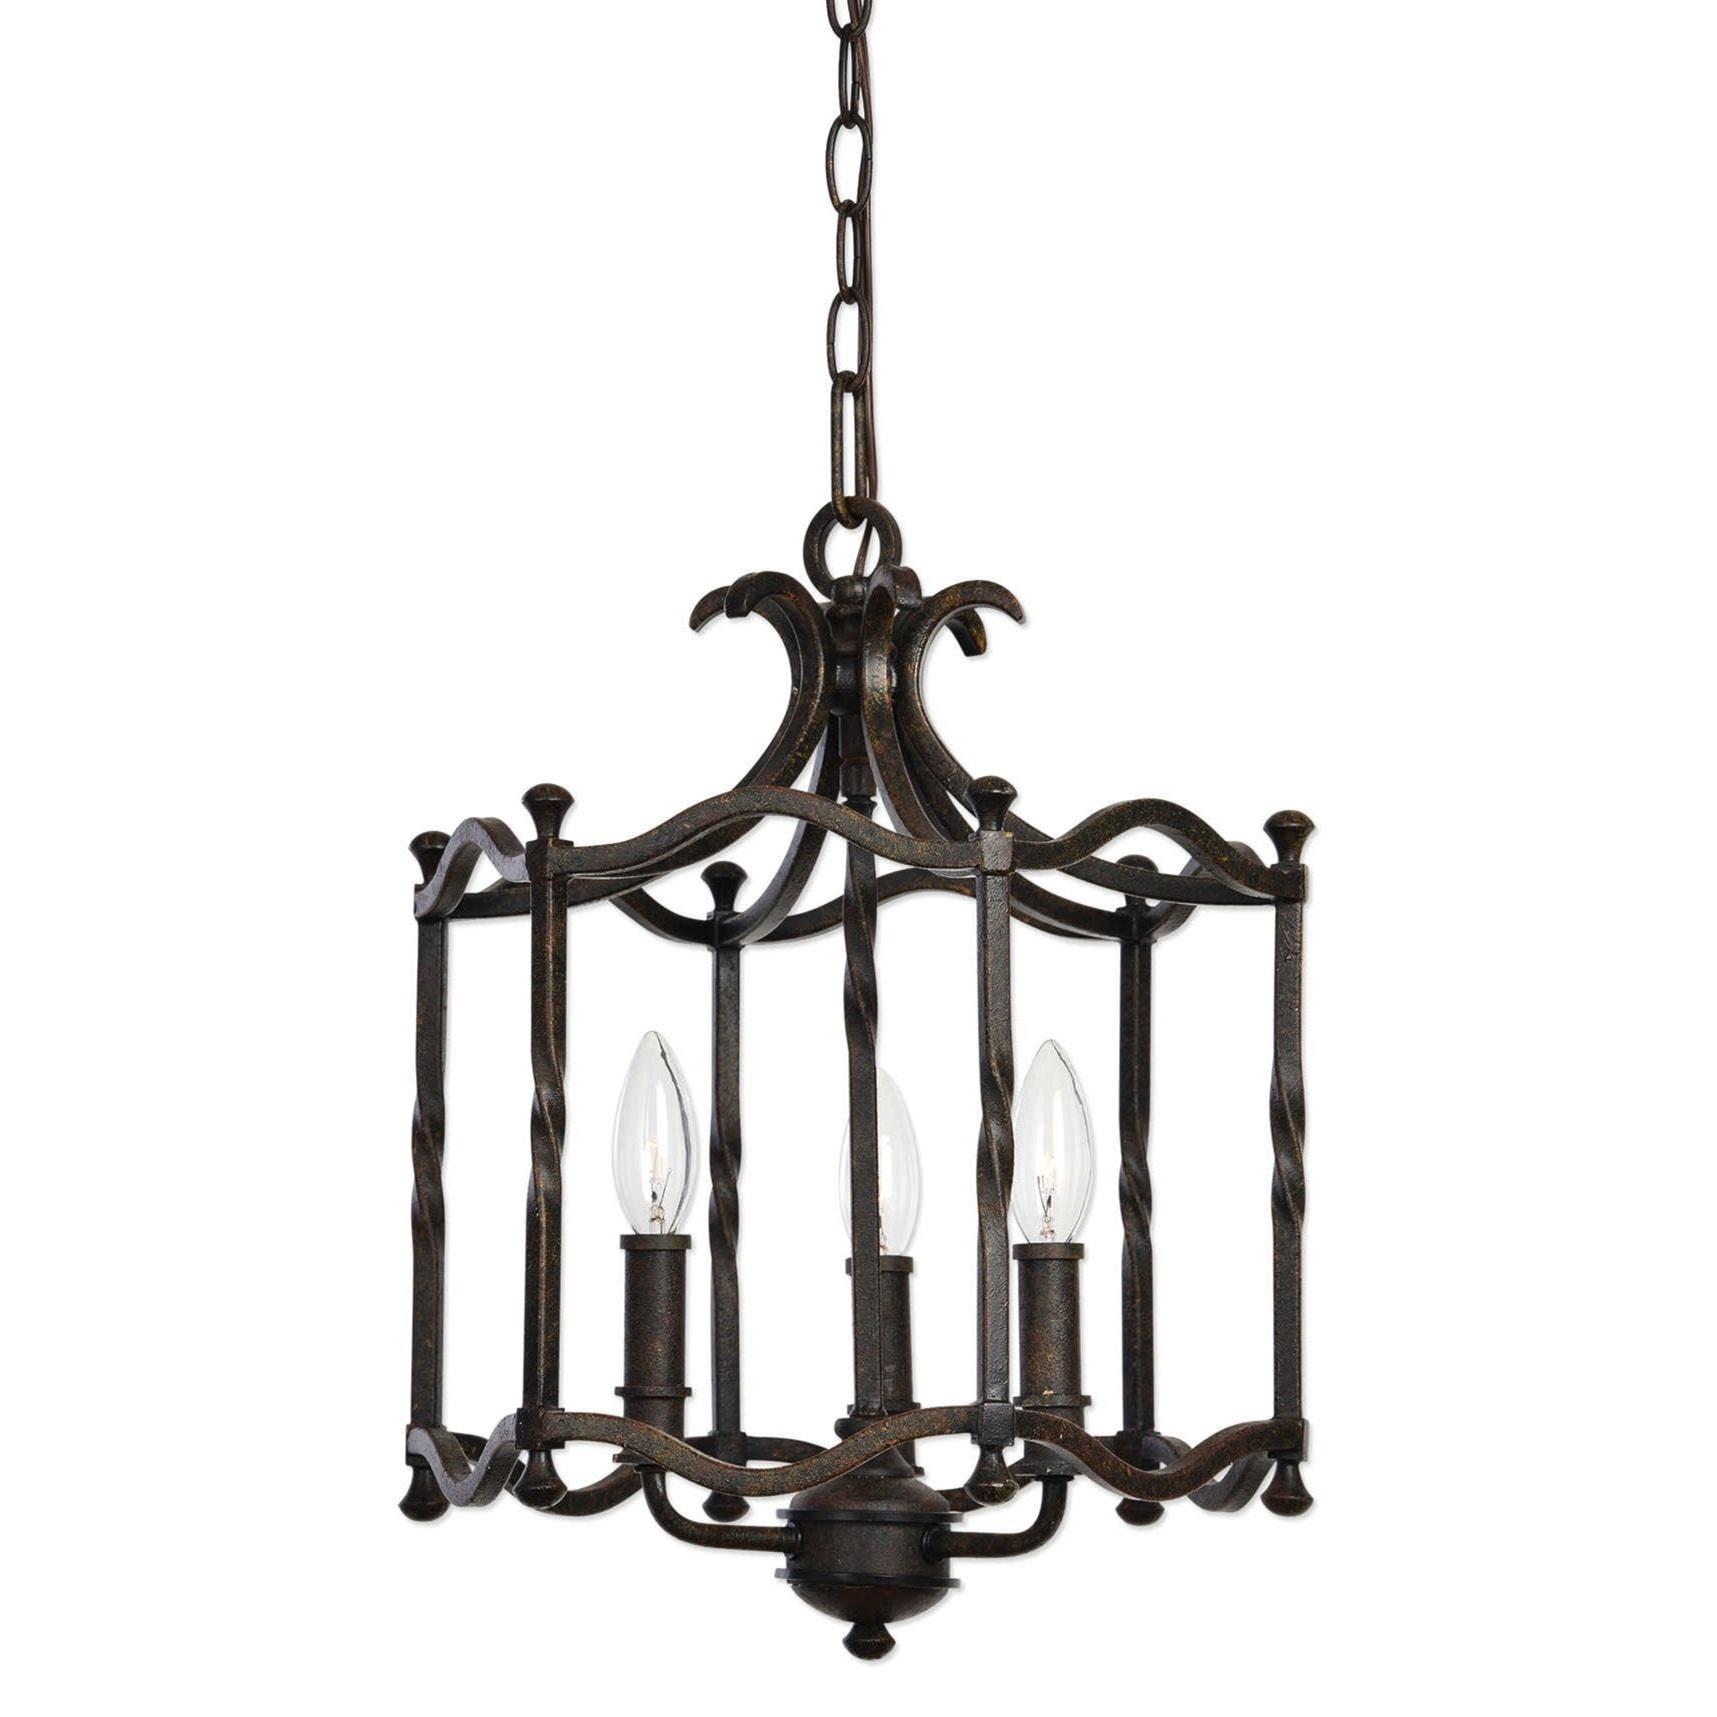 becker lighting. Uttermost Lighting Fixtures 22112 Candela Old World 3 Light Pendant   Becker Furniture Lights/Chandeliers